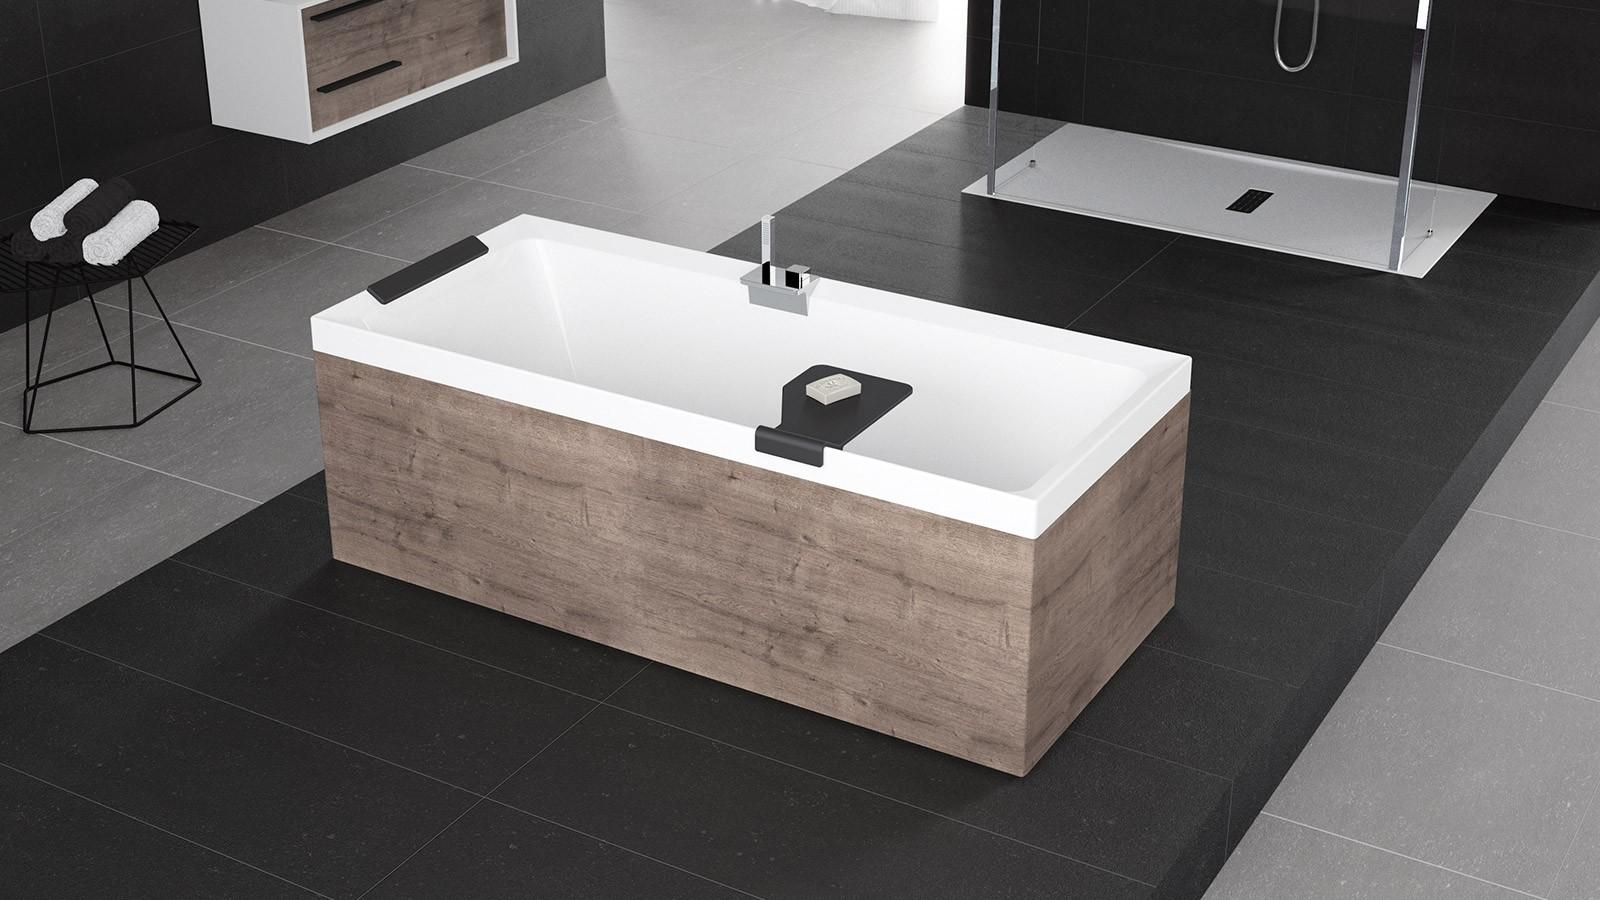 Immagini vasche with immagini vasche immagini vasche - Vasca da bagno immagini ...